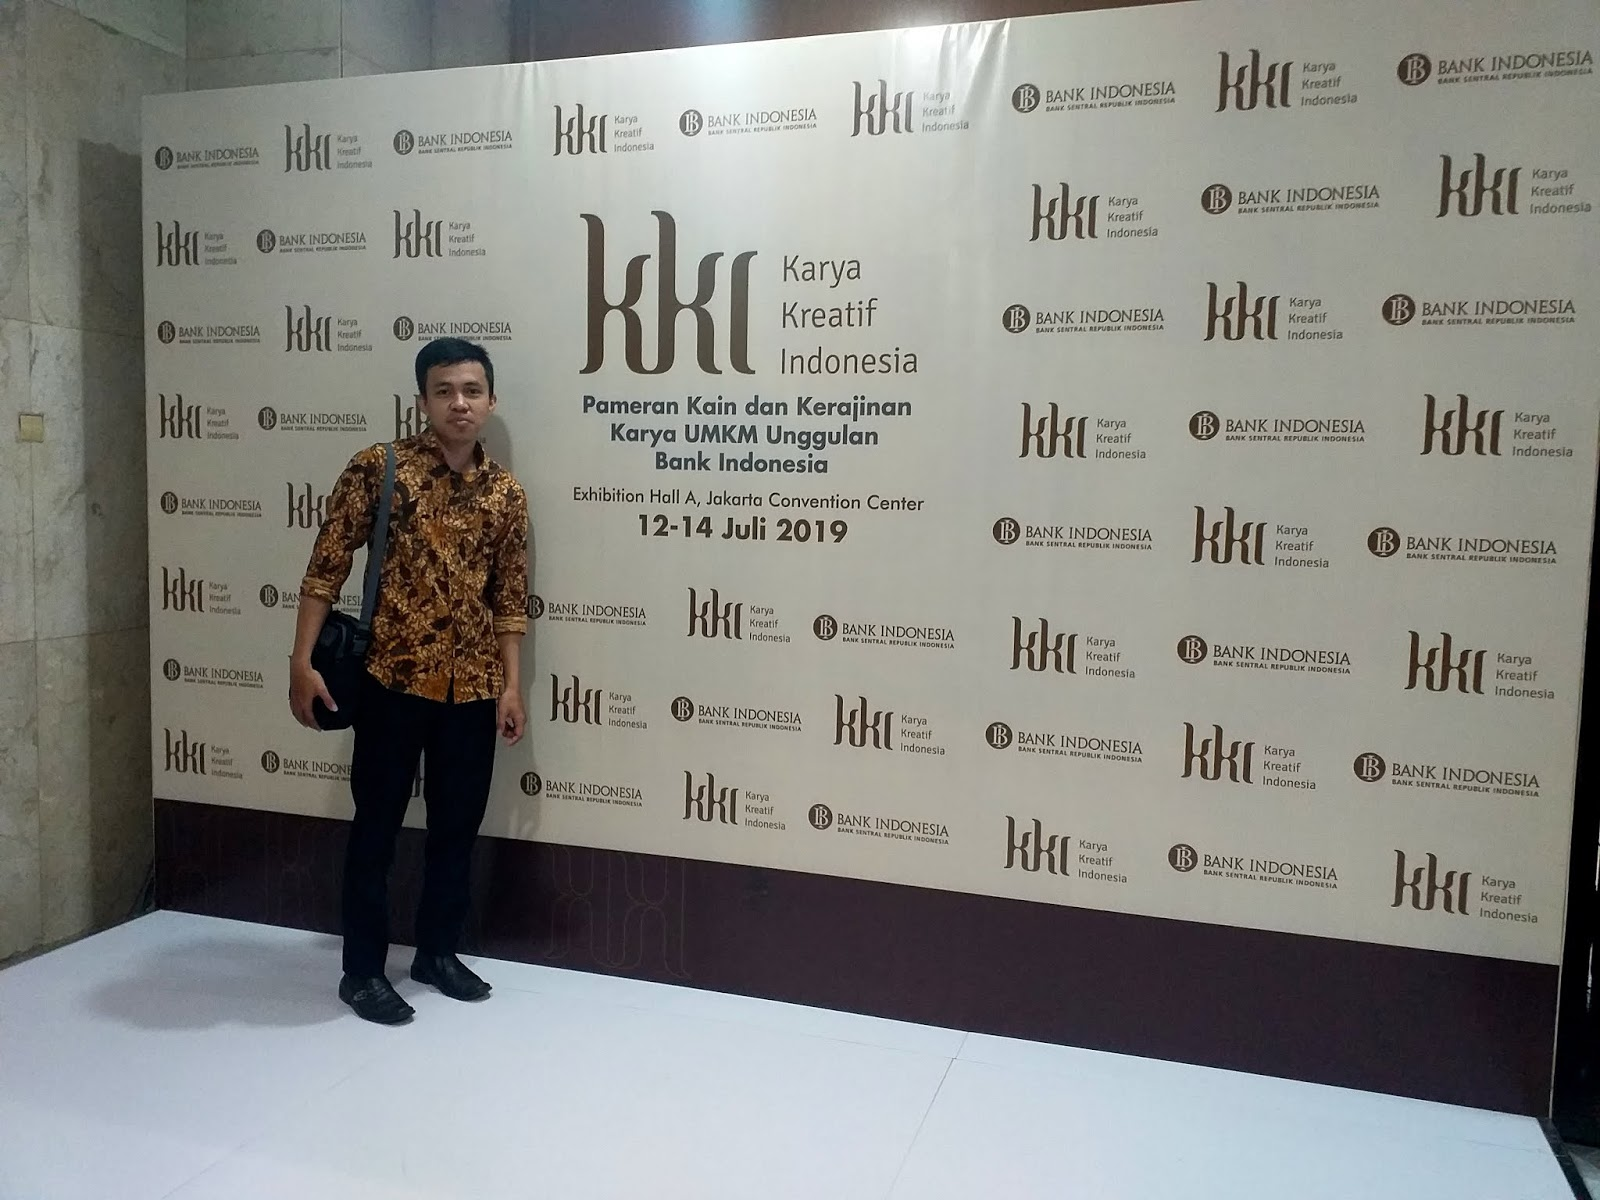 Pameran Karya Kreatif Indonesia 2019 Jakarta Convention Center